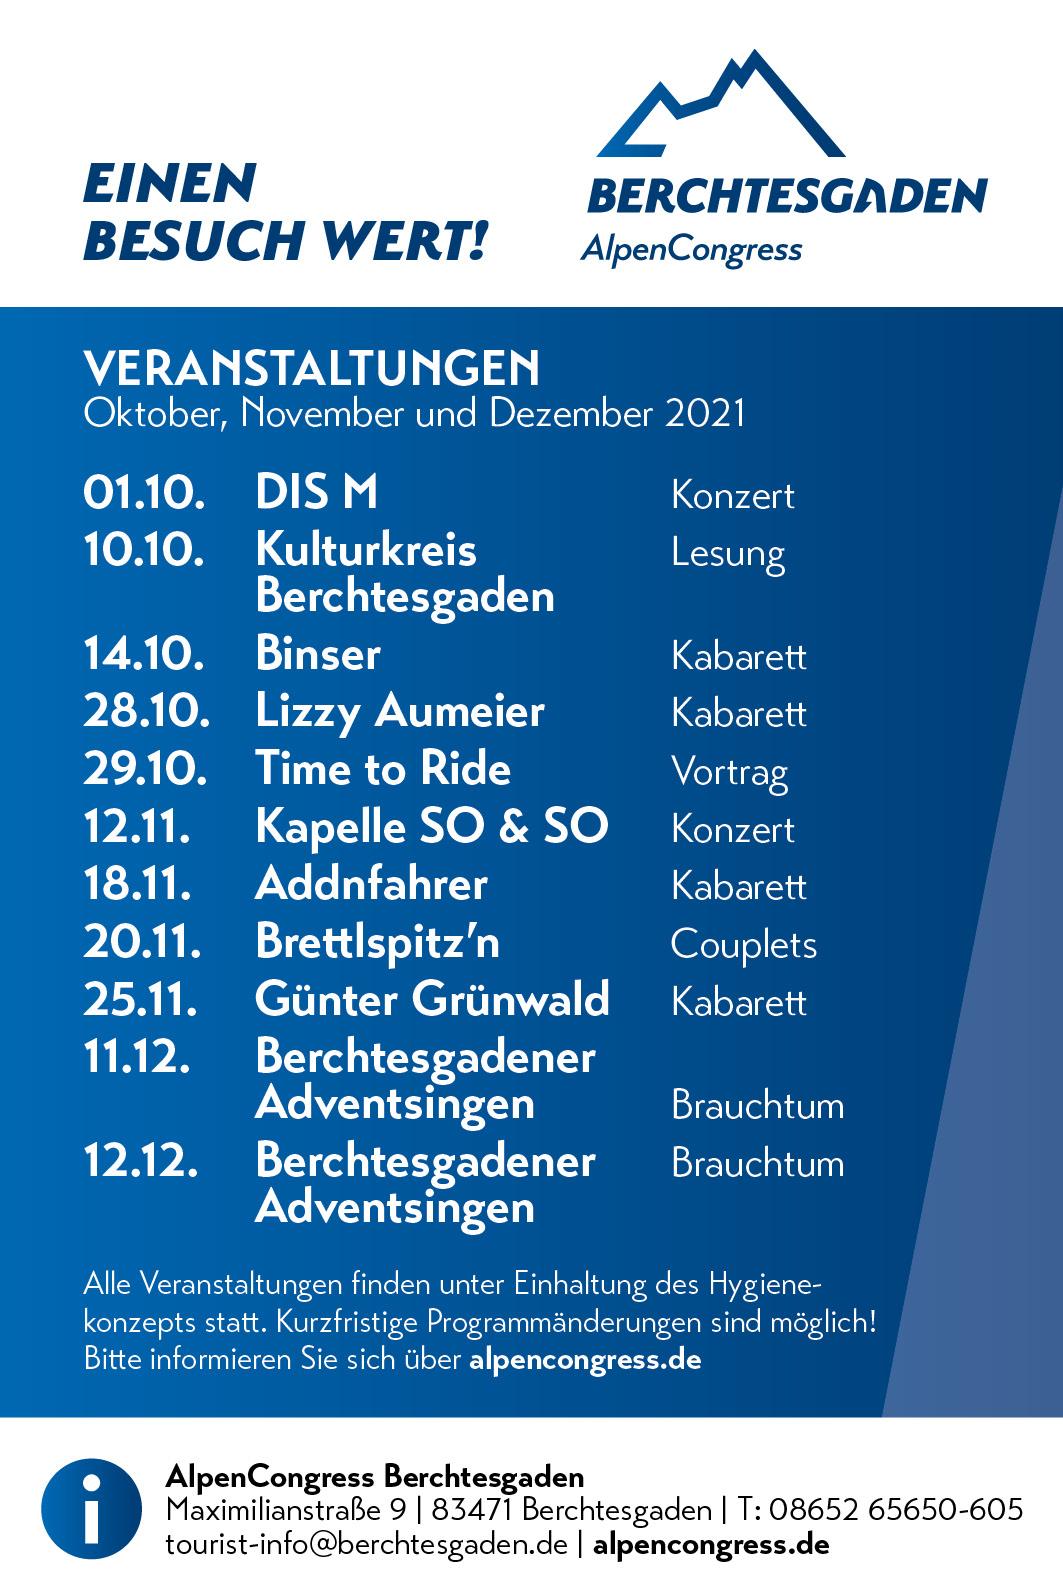 Veranstaltungen Oktober bis Dezember